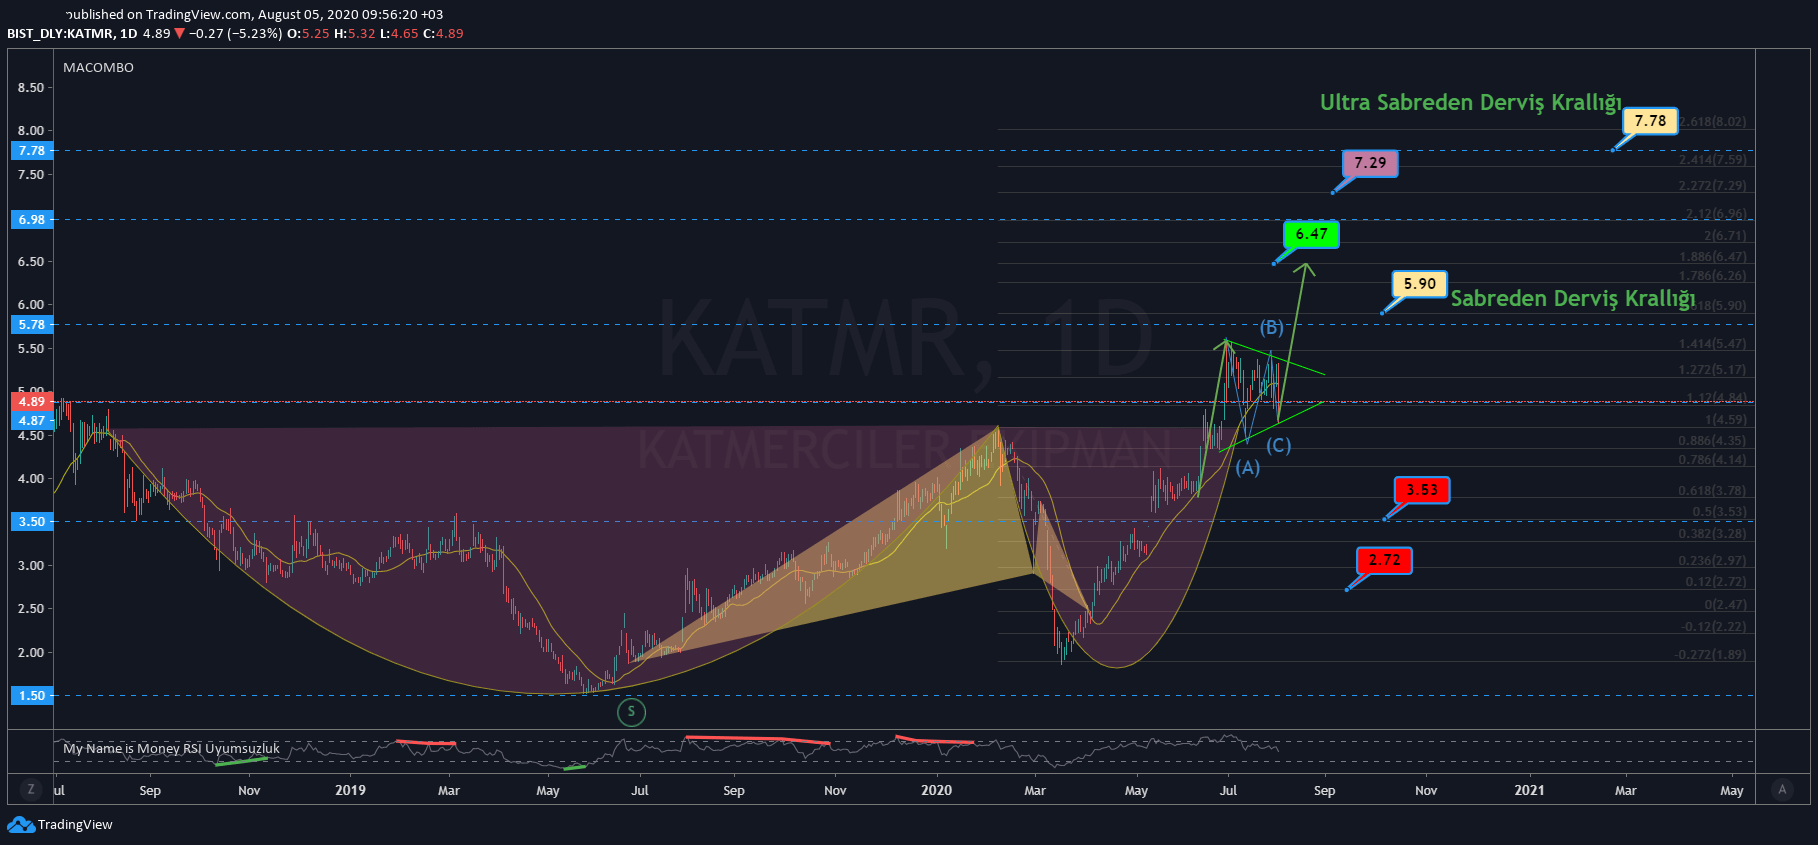 MyNameisMoney'den #KATMR Hisse Teknik Analizi 05.08.2020